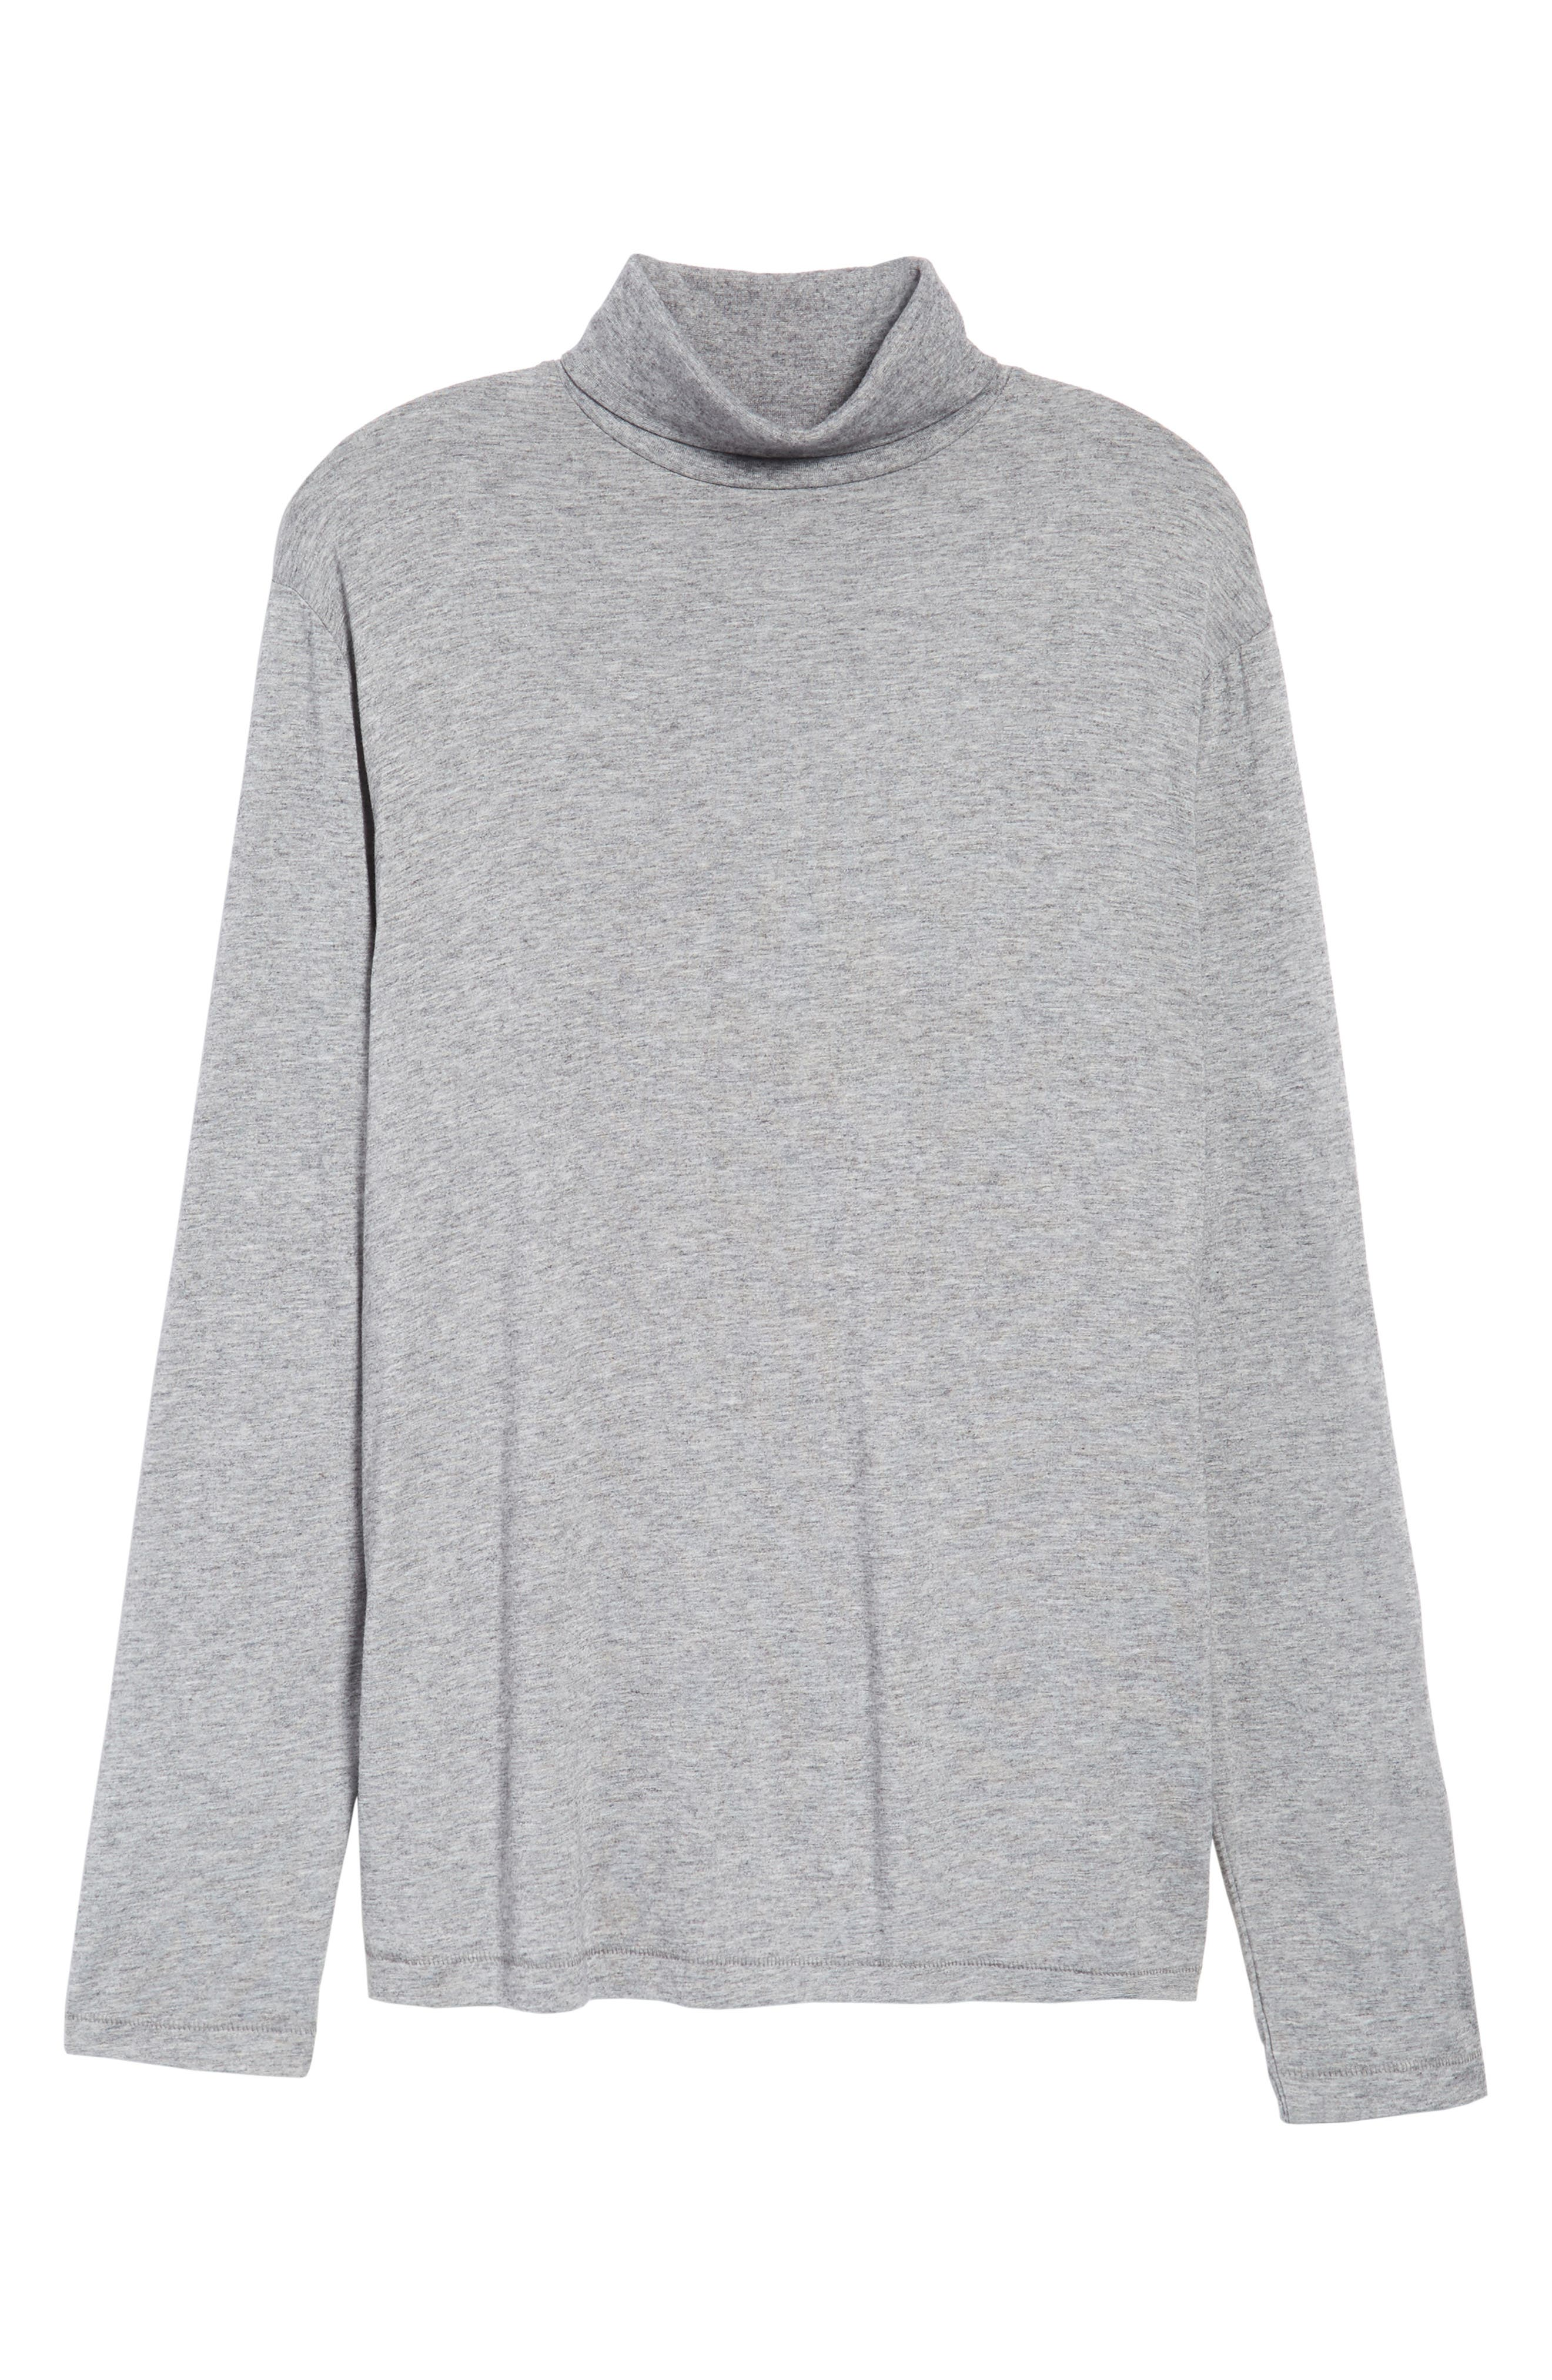 Lightweight Turtleneck Sweater,                             Alternate thumbnail 6, color,                             030